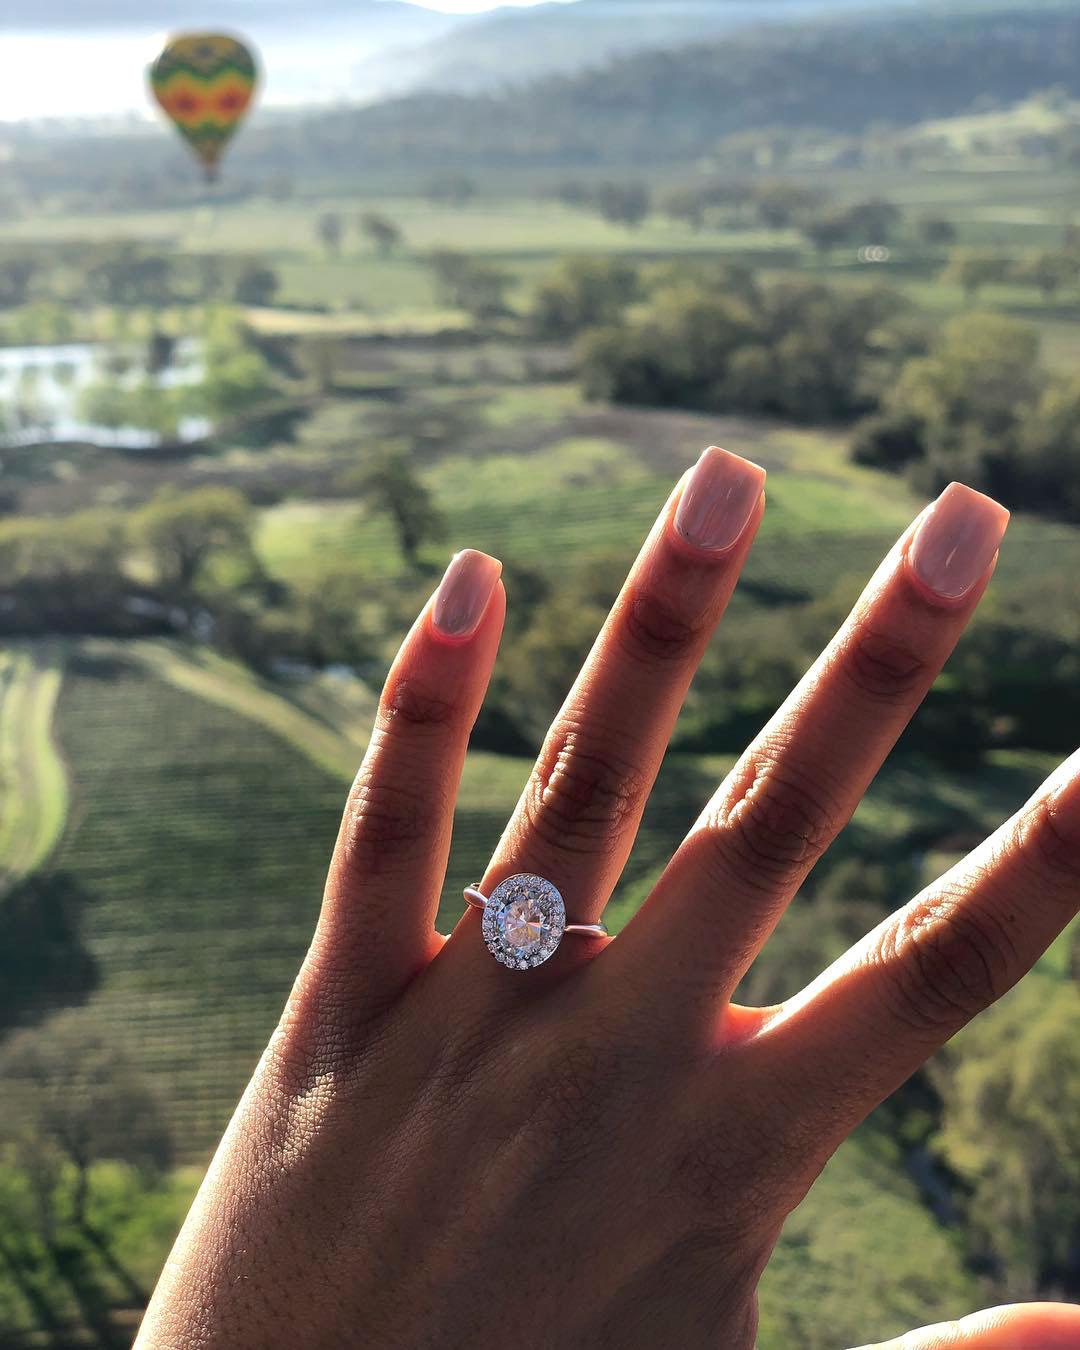 engagement ring selfie hot air balloon ride